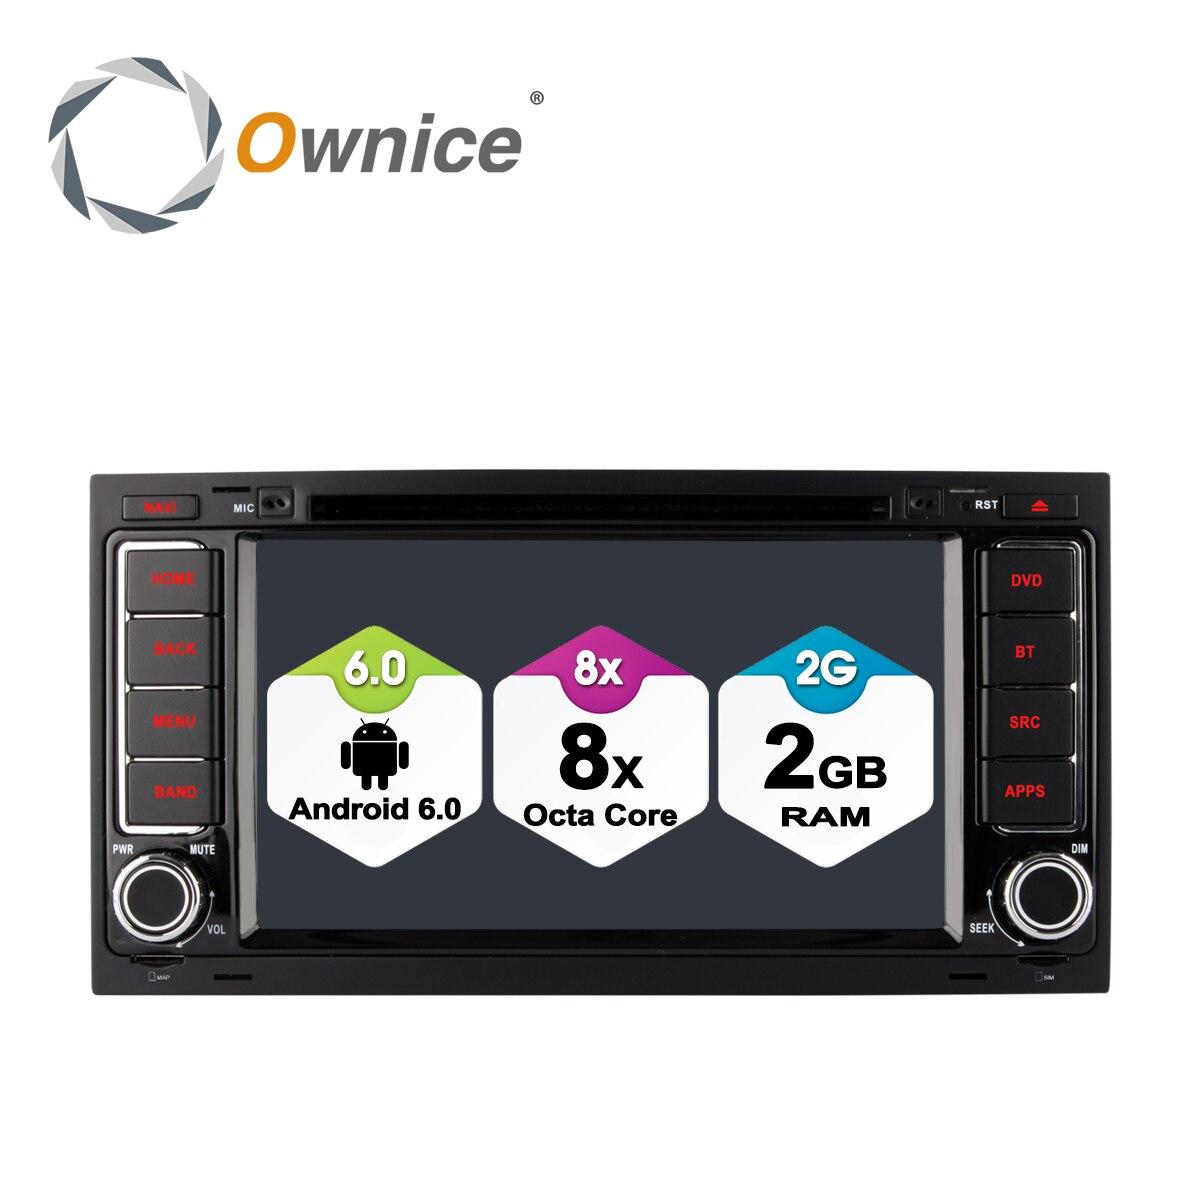 Ownice C500 Android 6.0 Octa Core 32g R0M Auto DVD Player für Volkswagen Touareg T5 Multivan Transporter GPS Navi 4g LTE Netzwerk